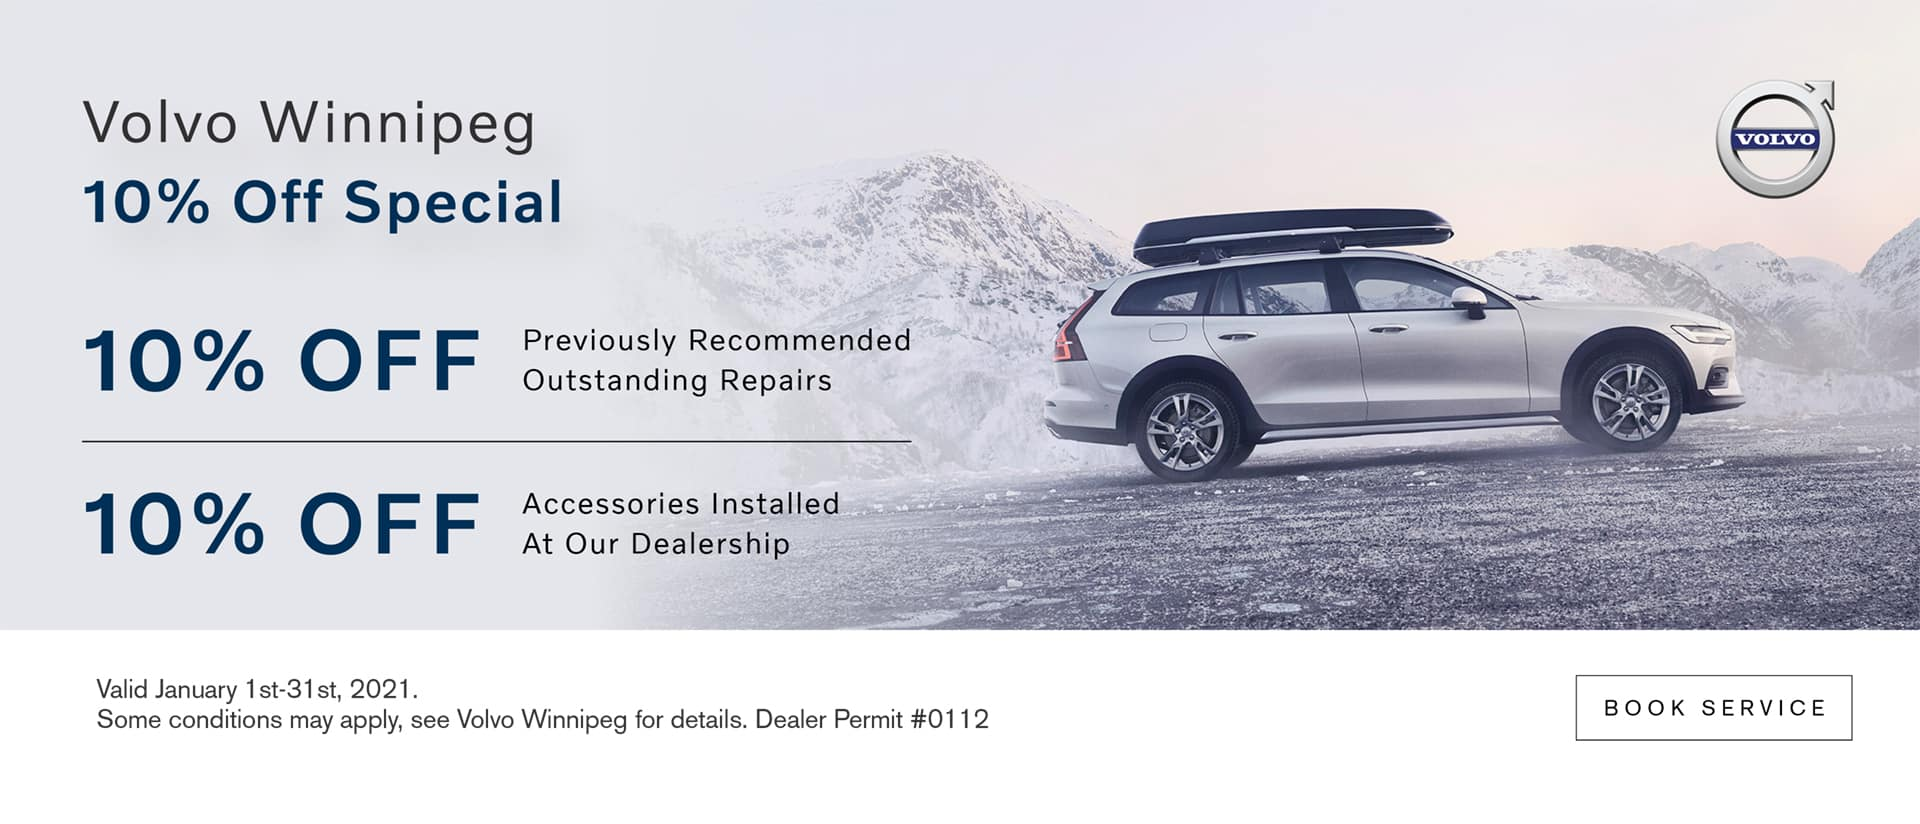 Volvo-01-SERVICE-WebsiteBanner-D